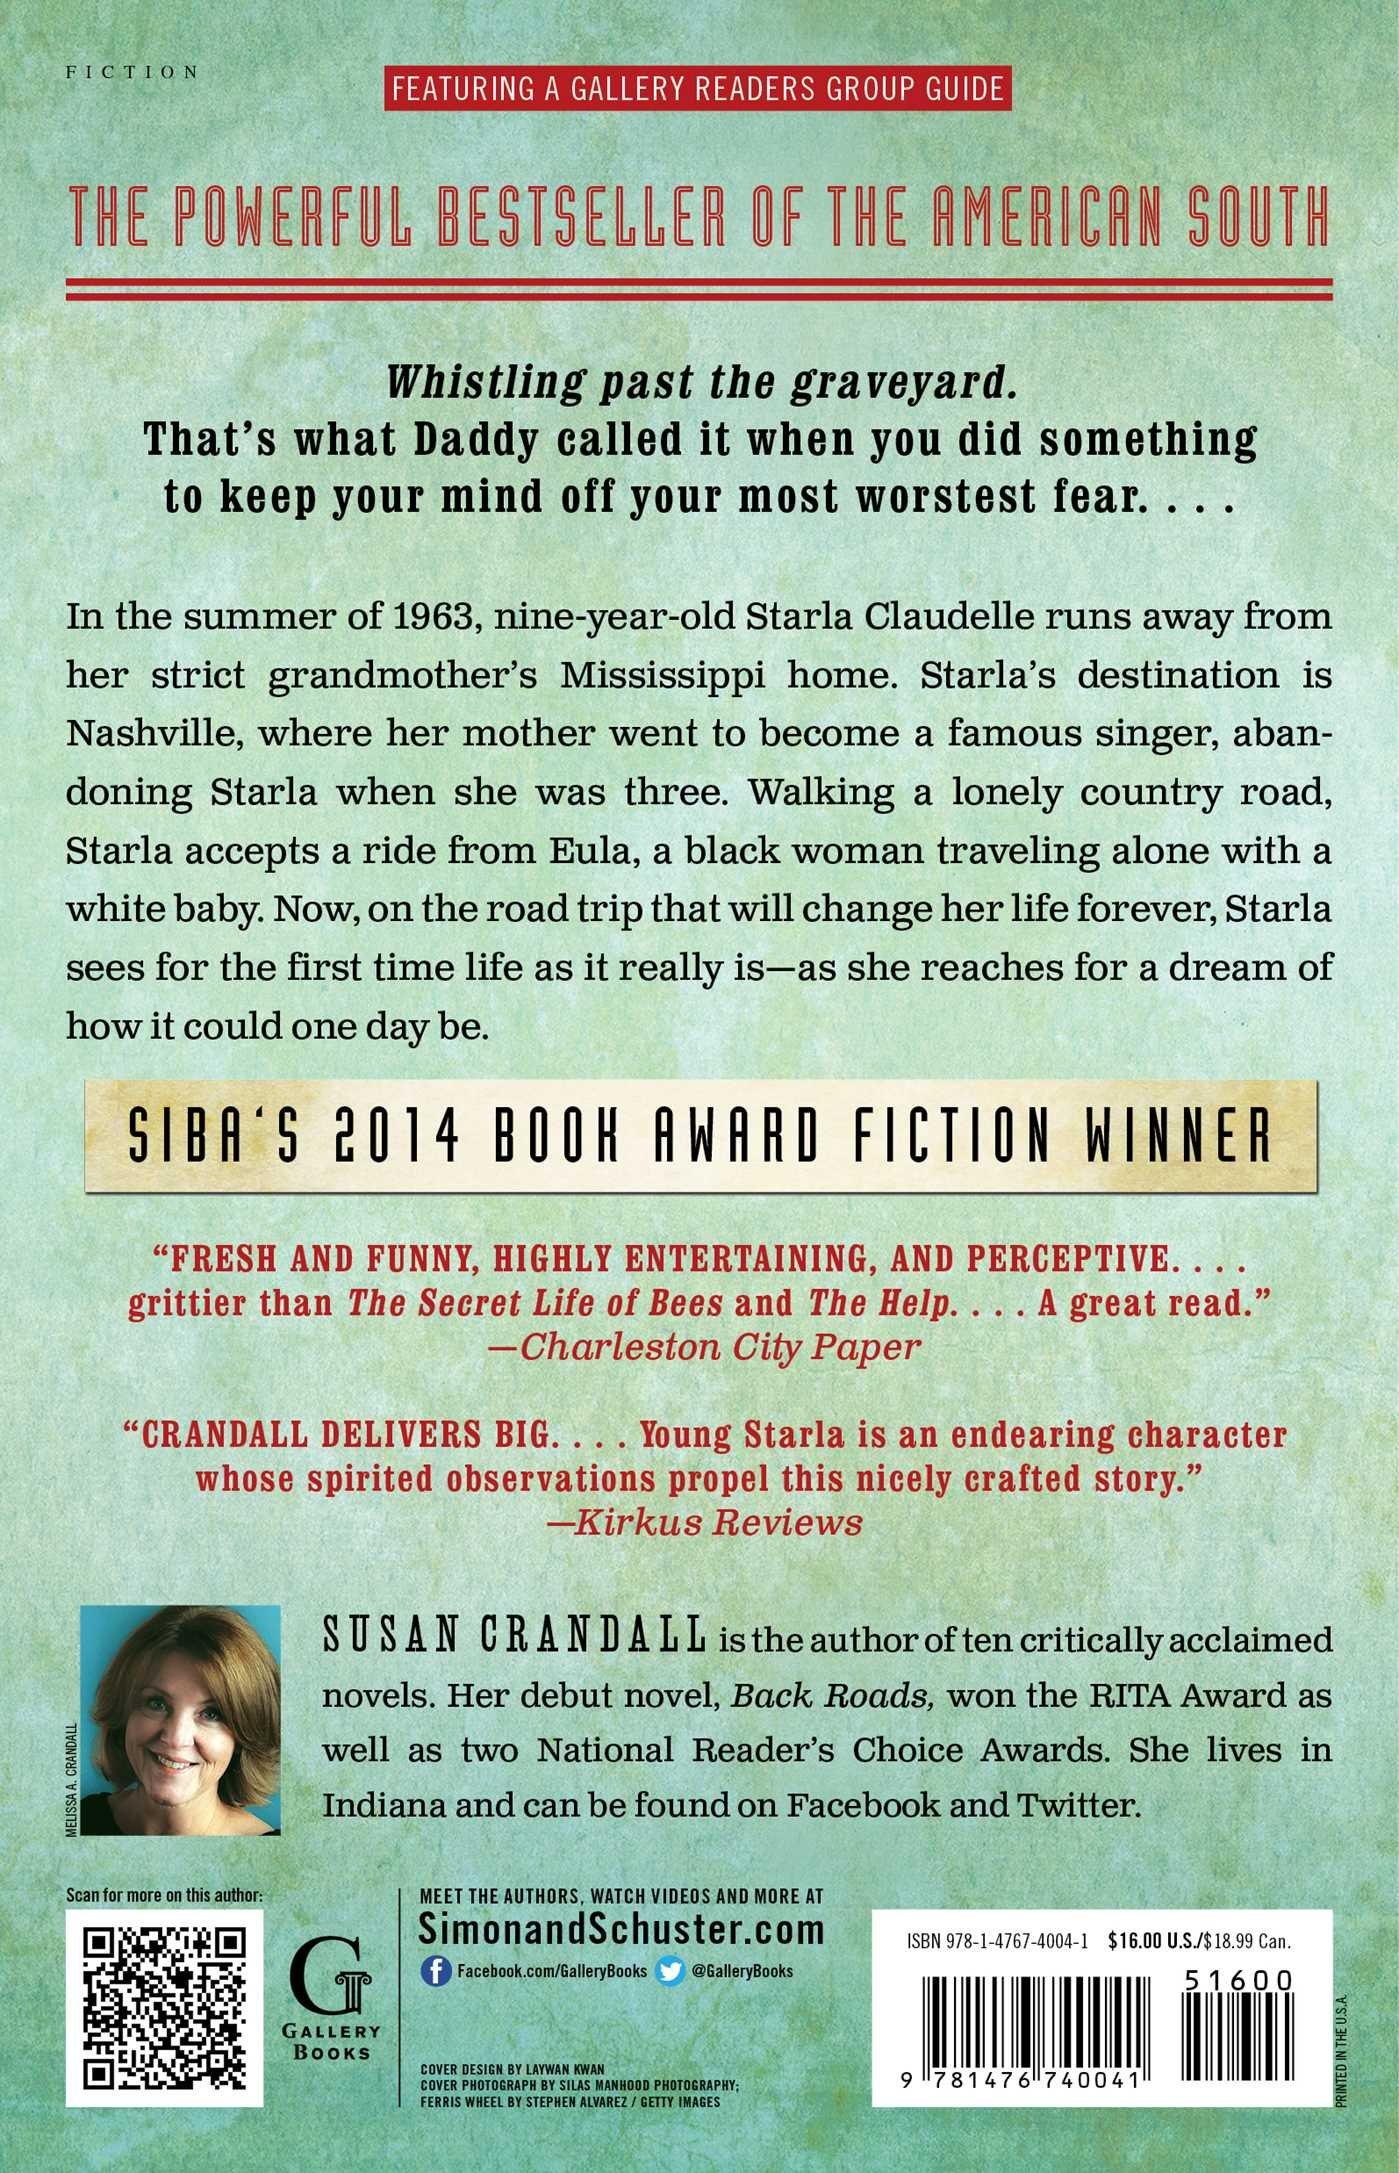 Whistling Past The Graveyard: Susan Crandall: 9781476740041: Amazon:  Books